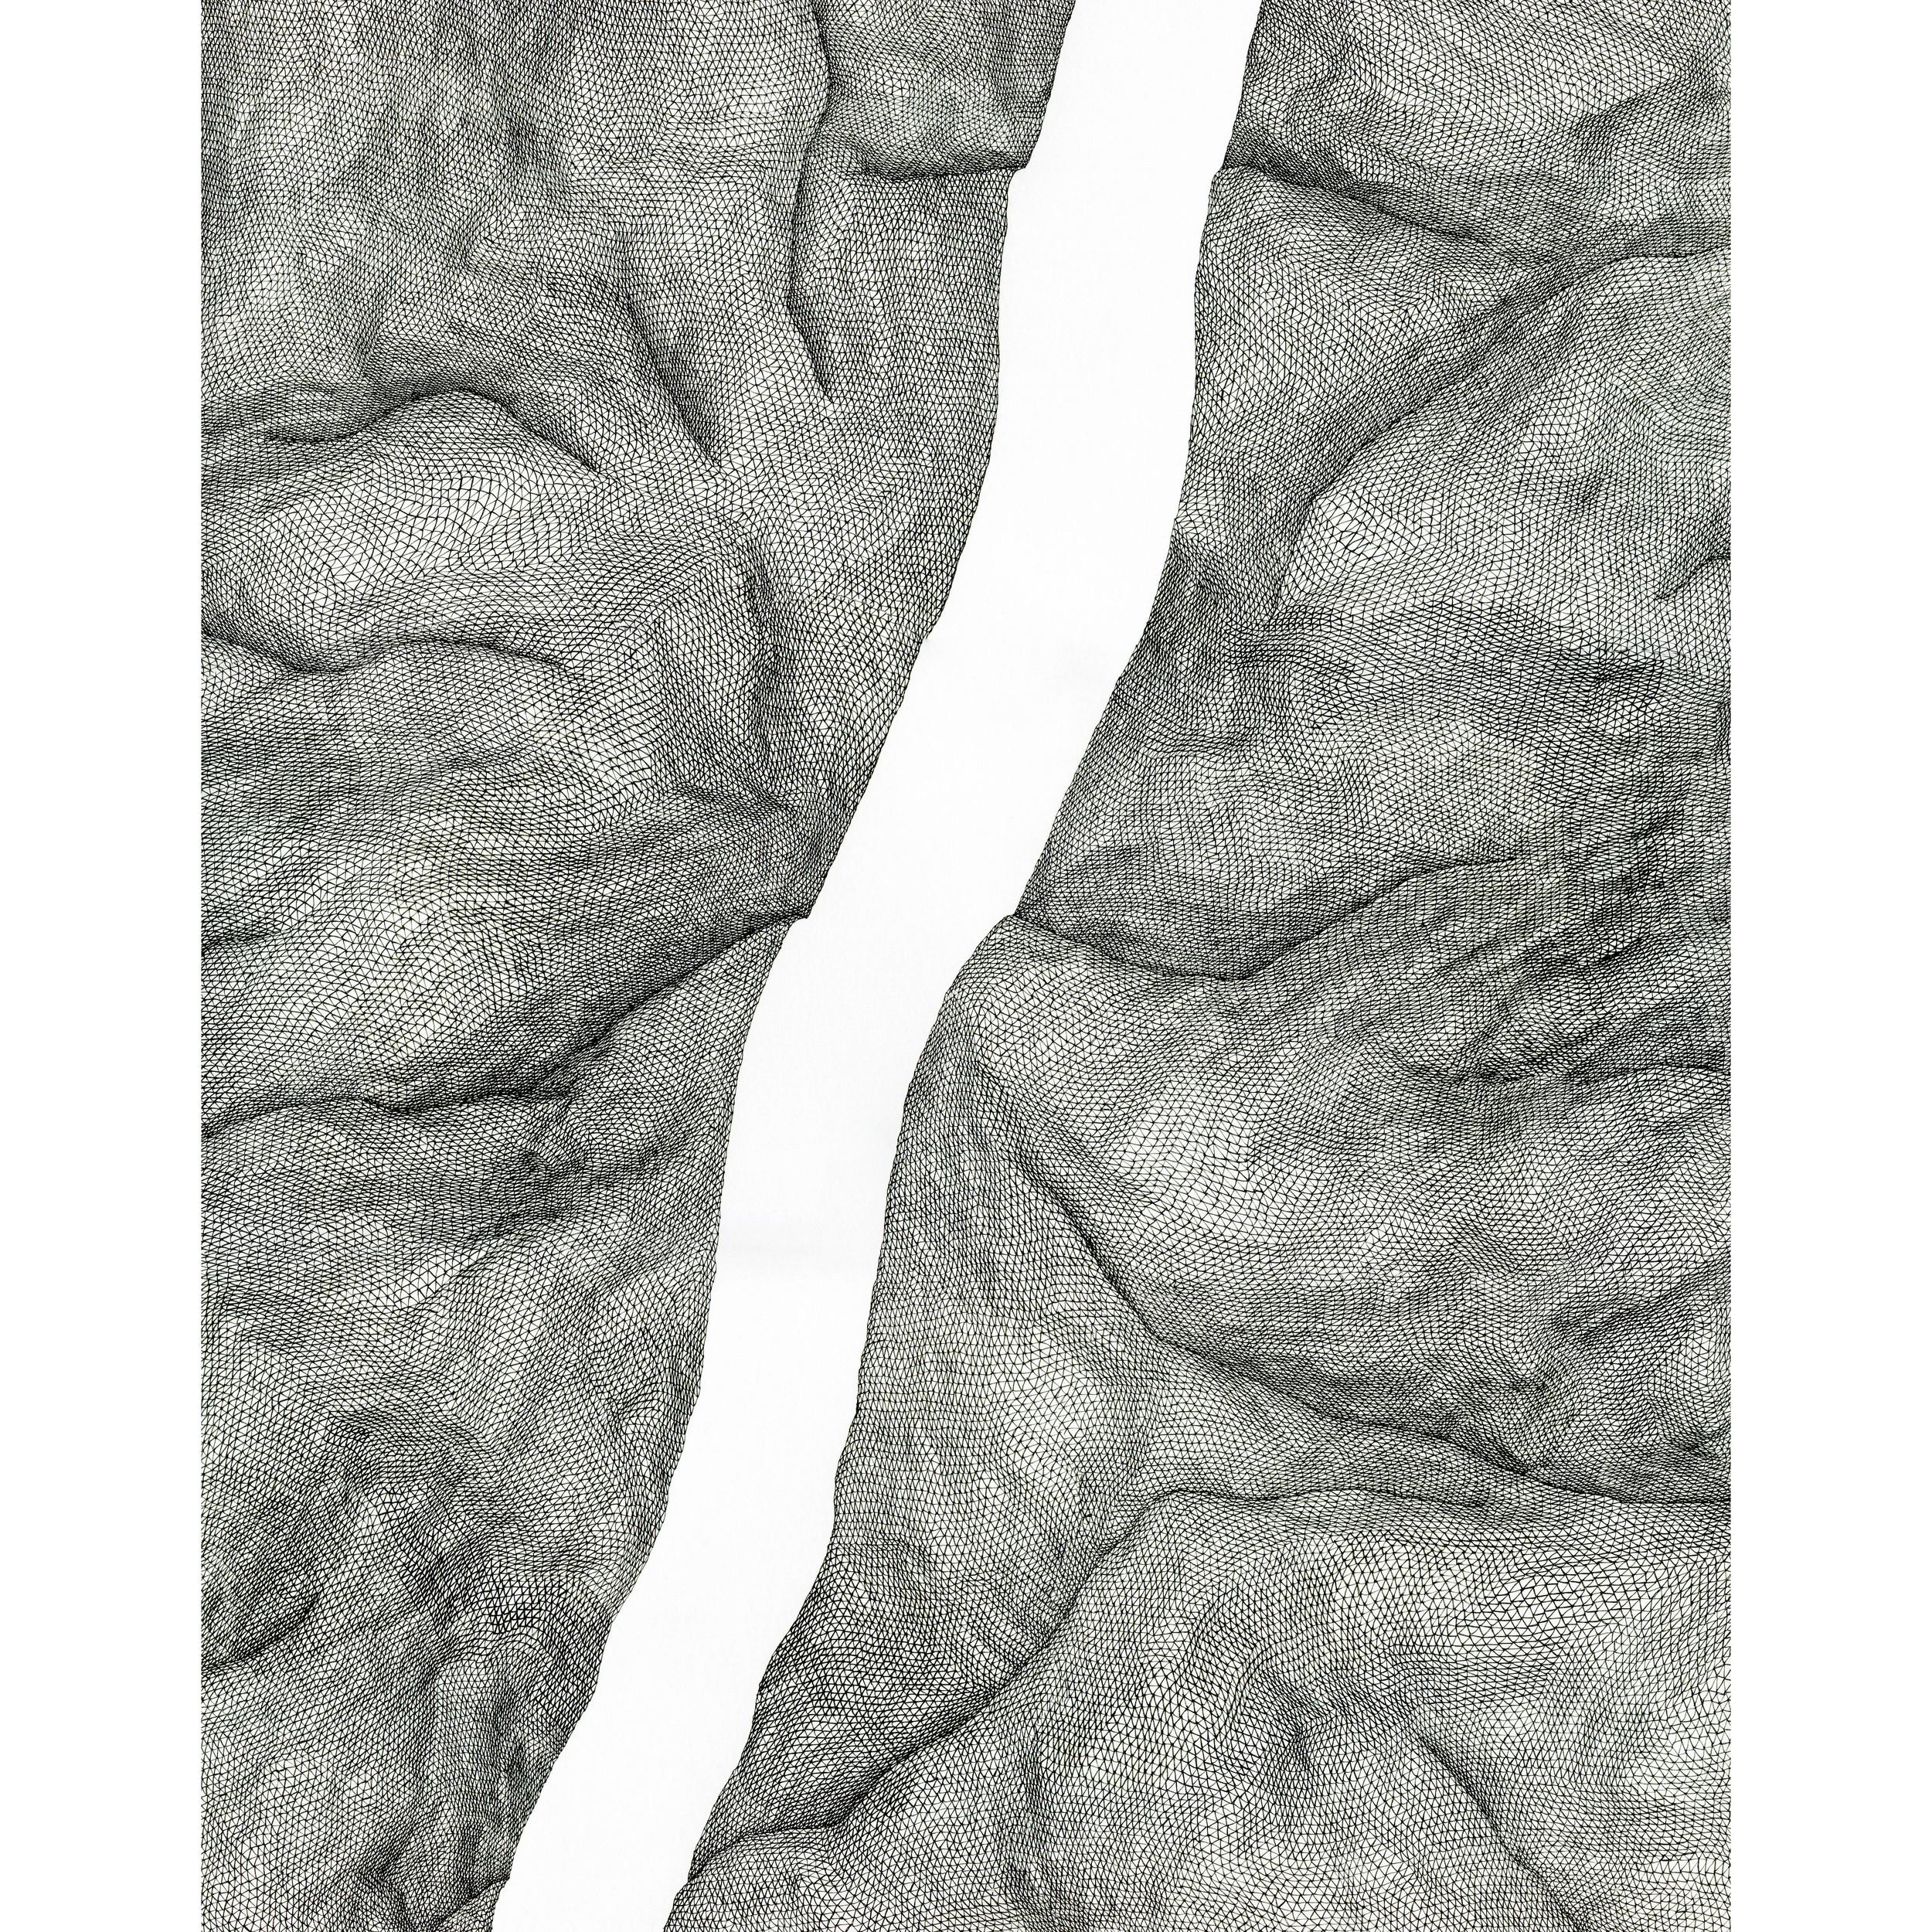 Land Slice